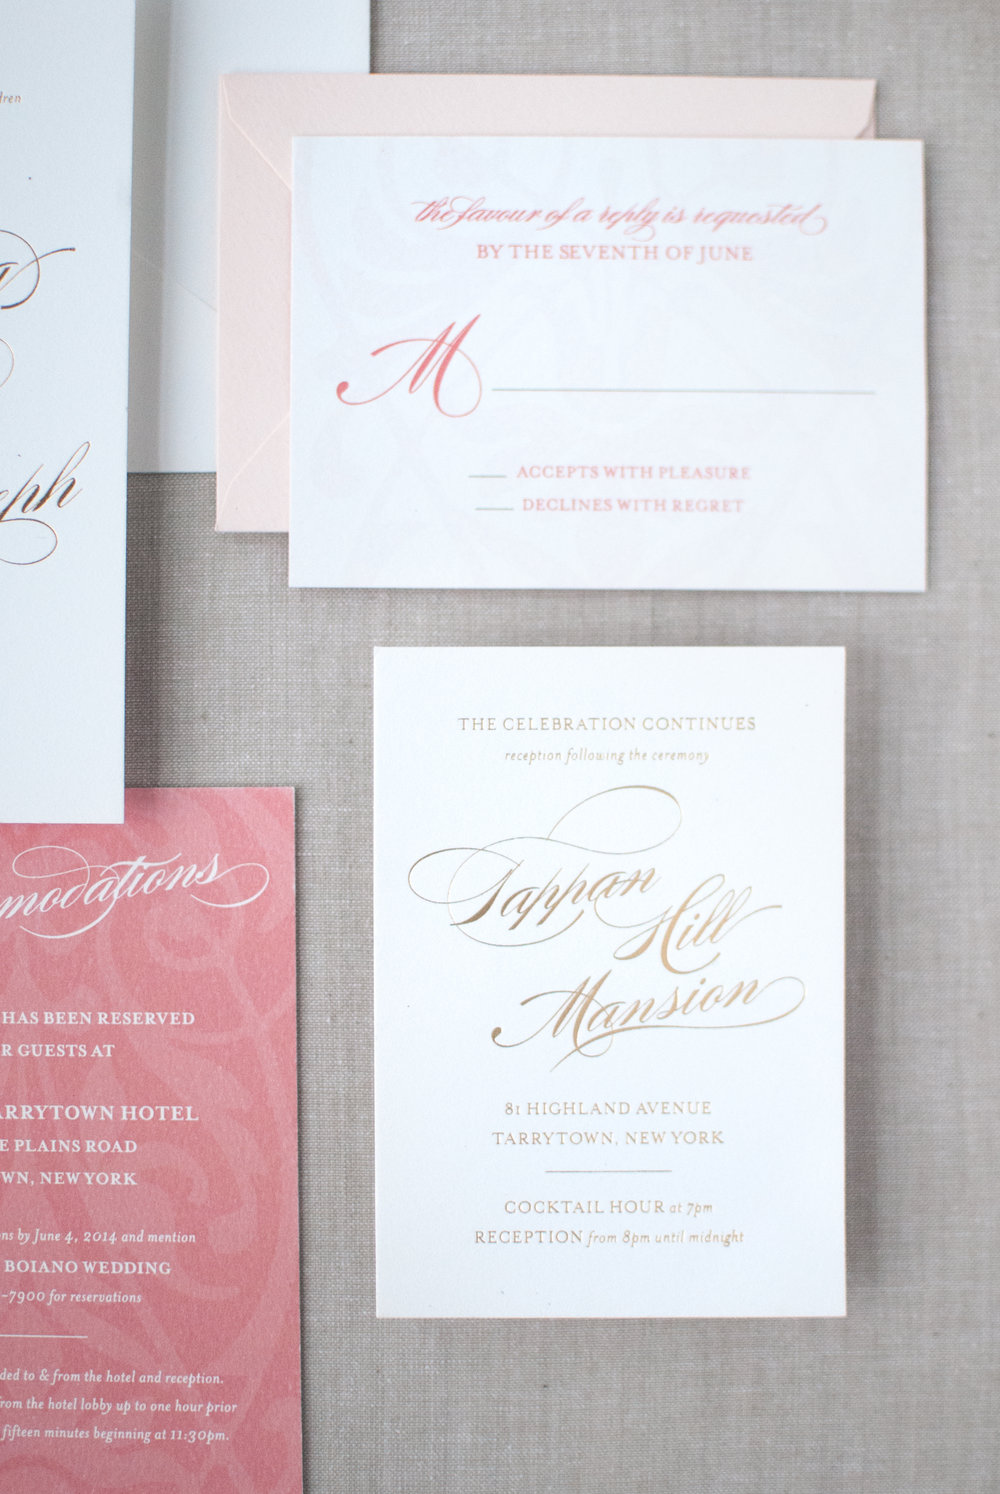 hj-wedding-invitations-daniela-anthony-7.jpg